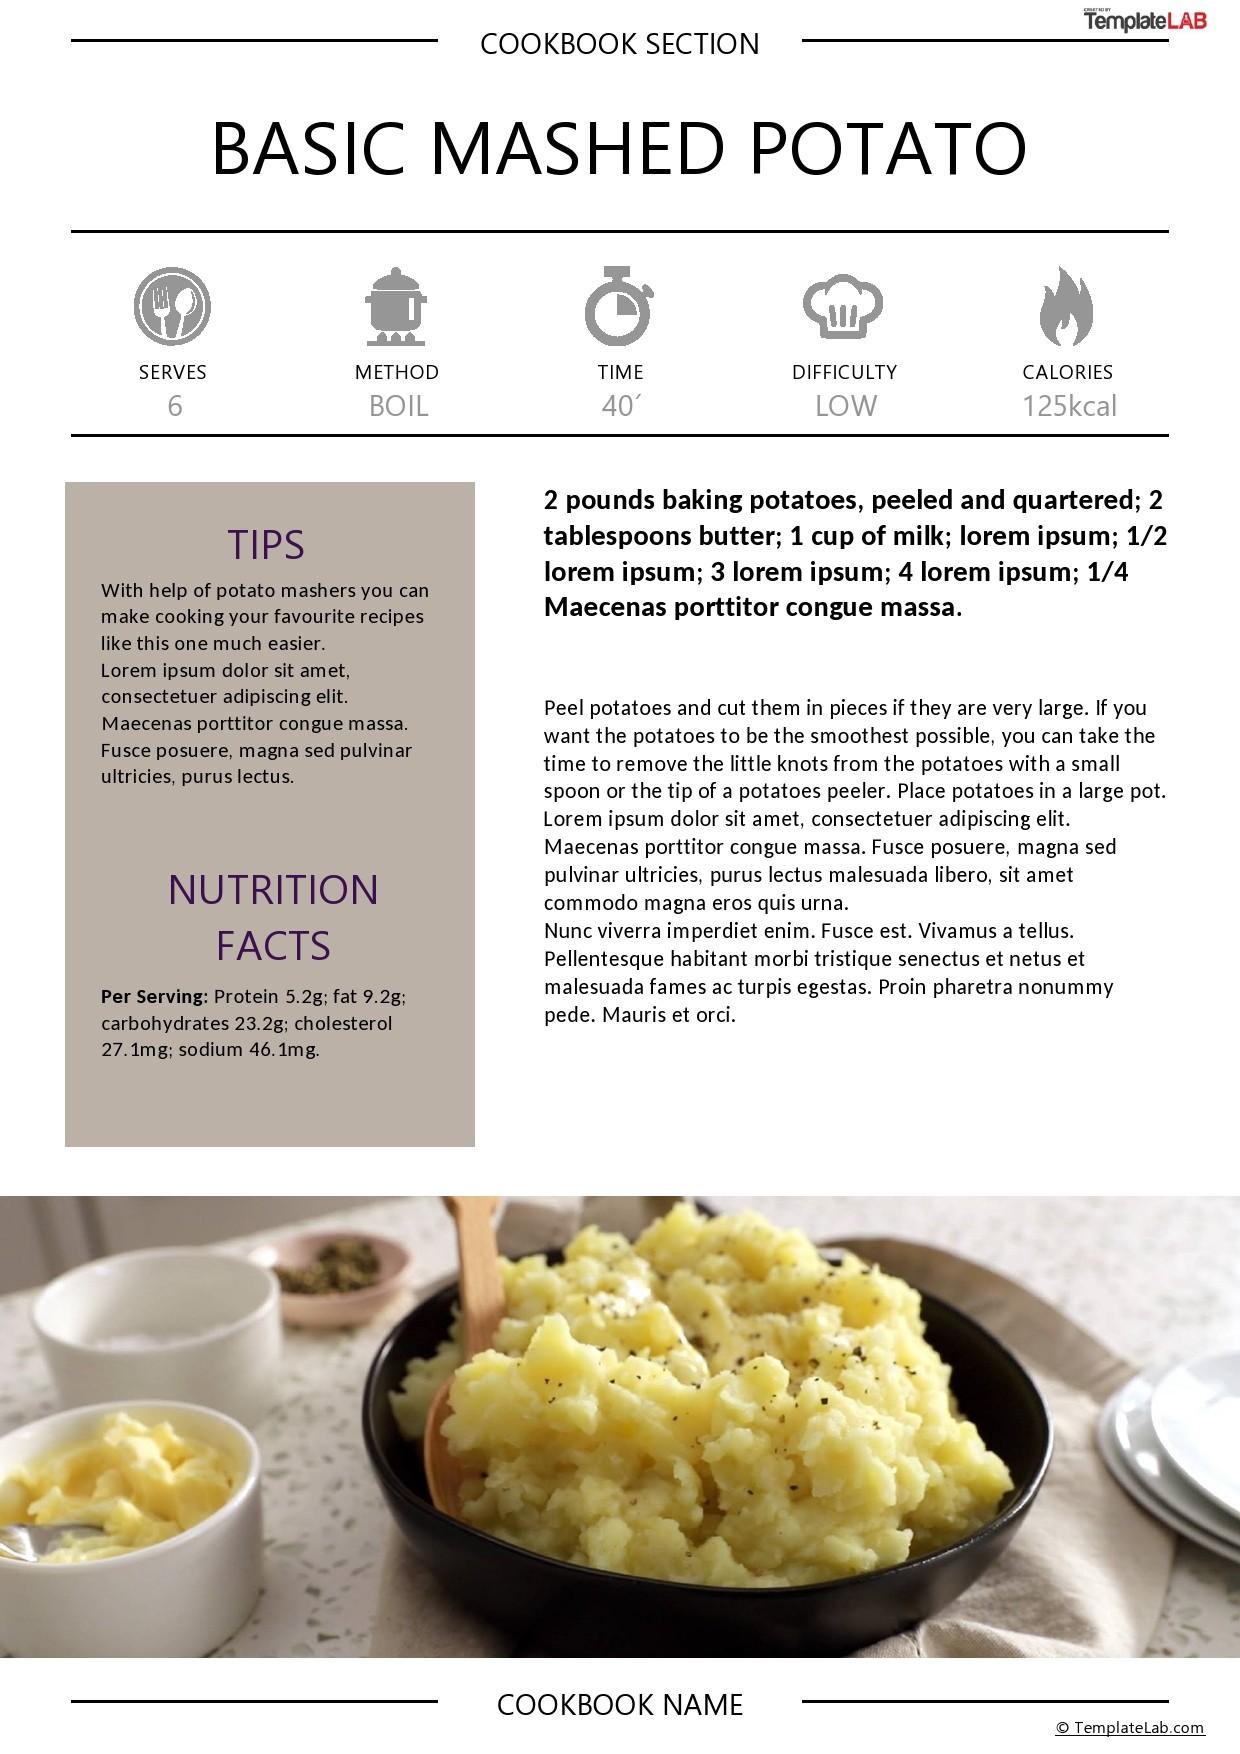 Free Cookbook Template 03 - TemplateLab.com